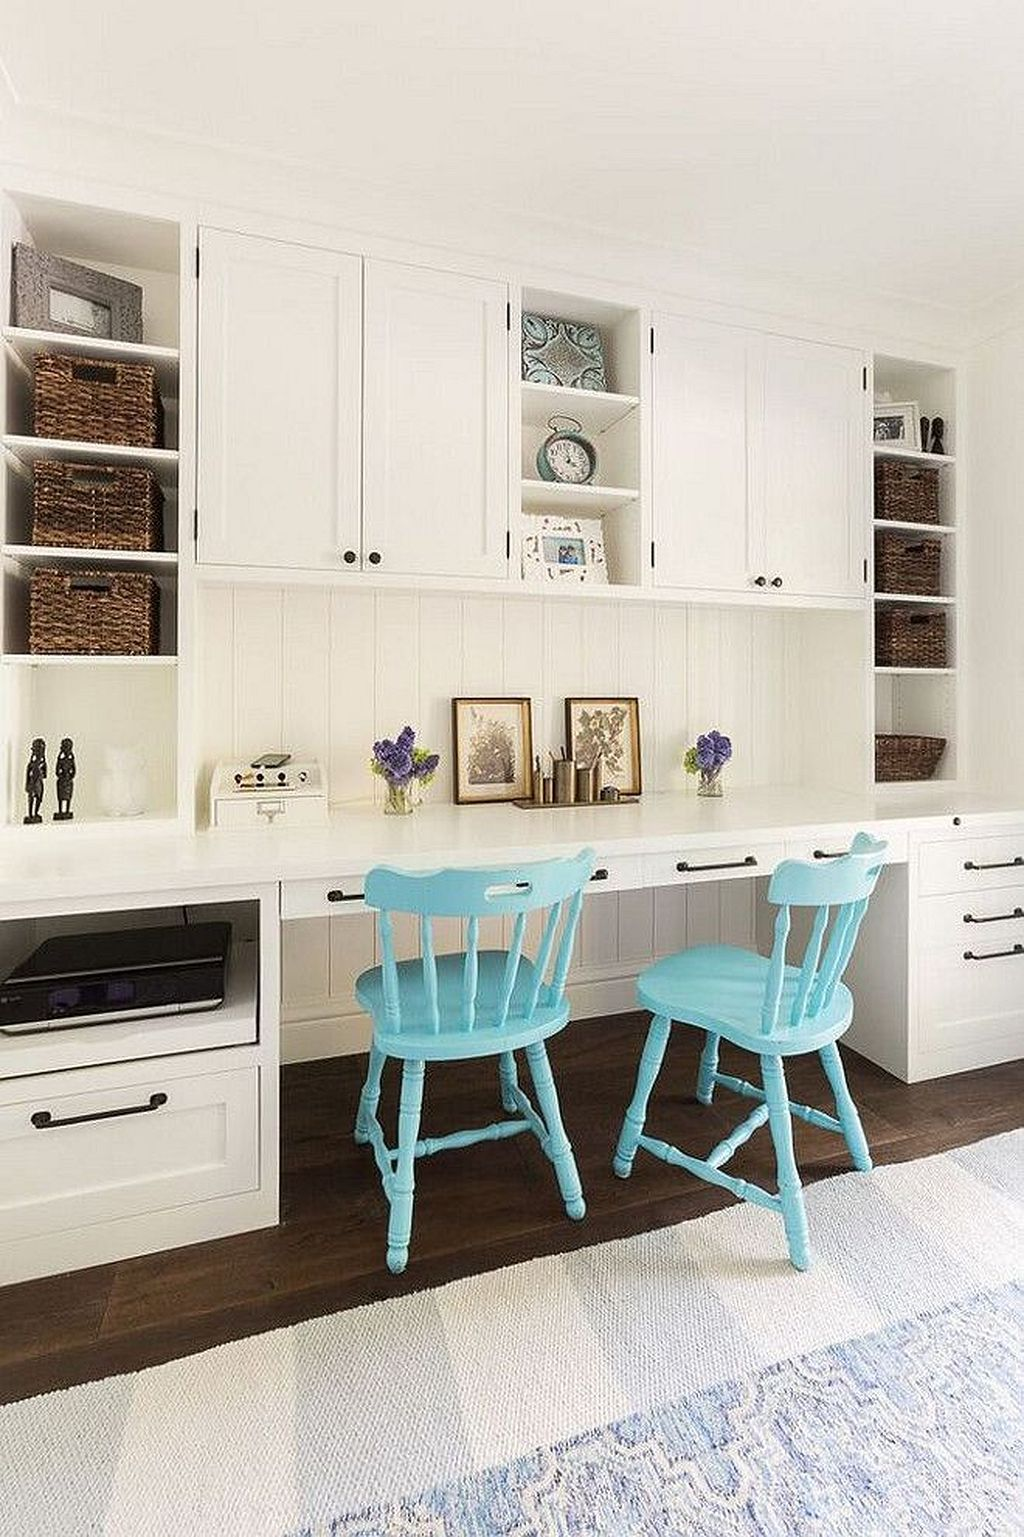 179 Custom Kitchen Design Ideas Home office